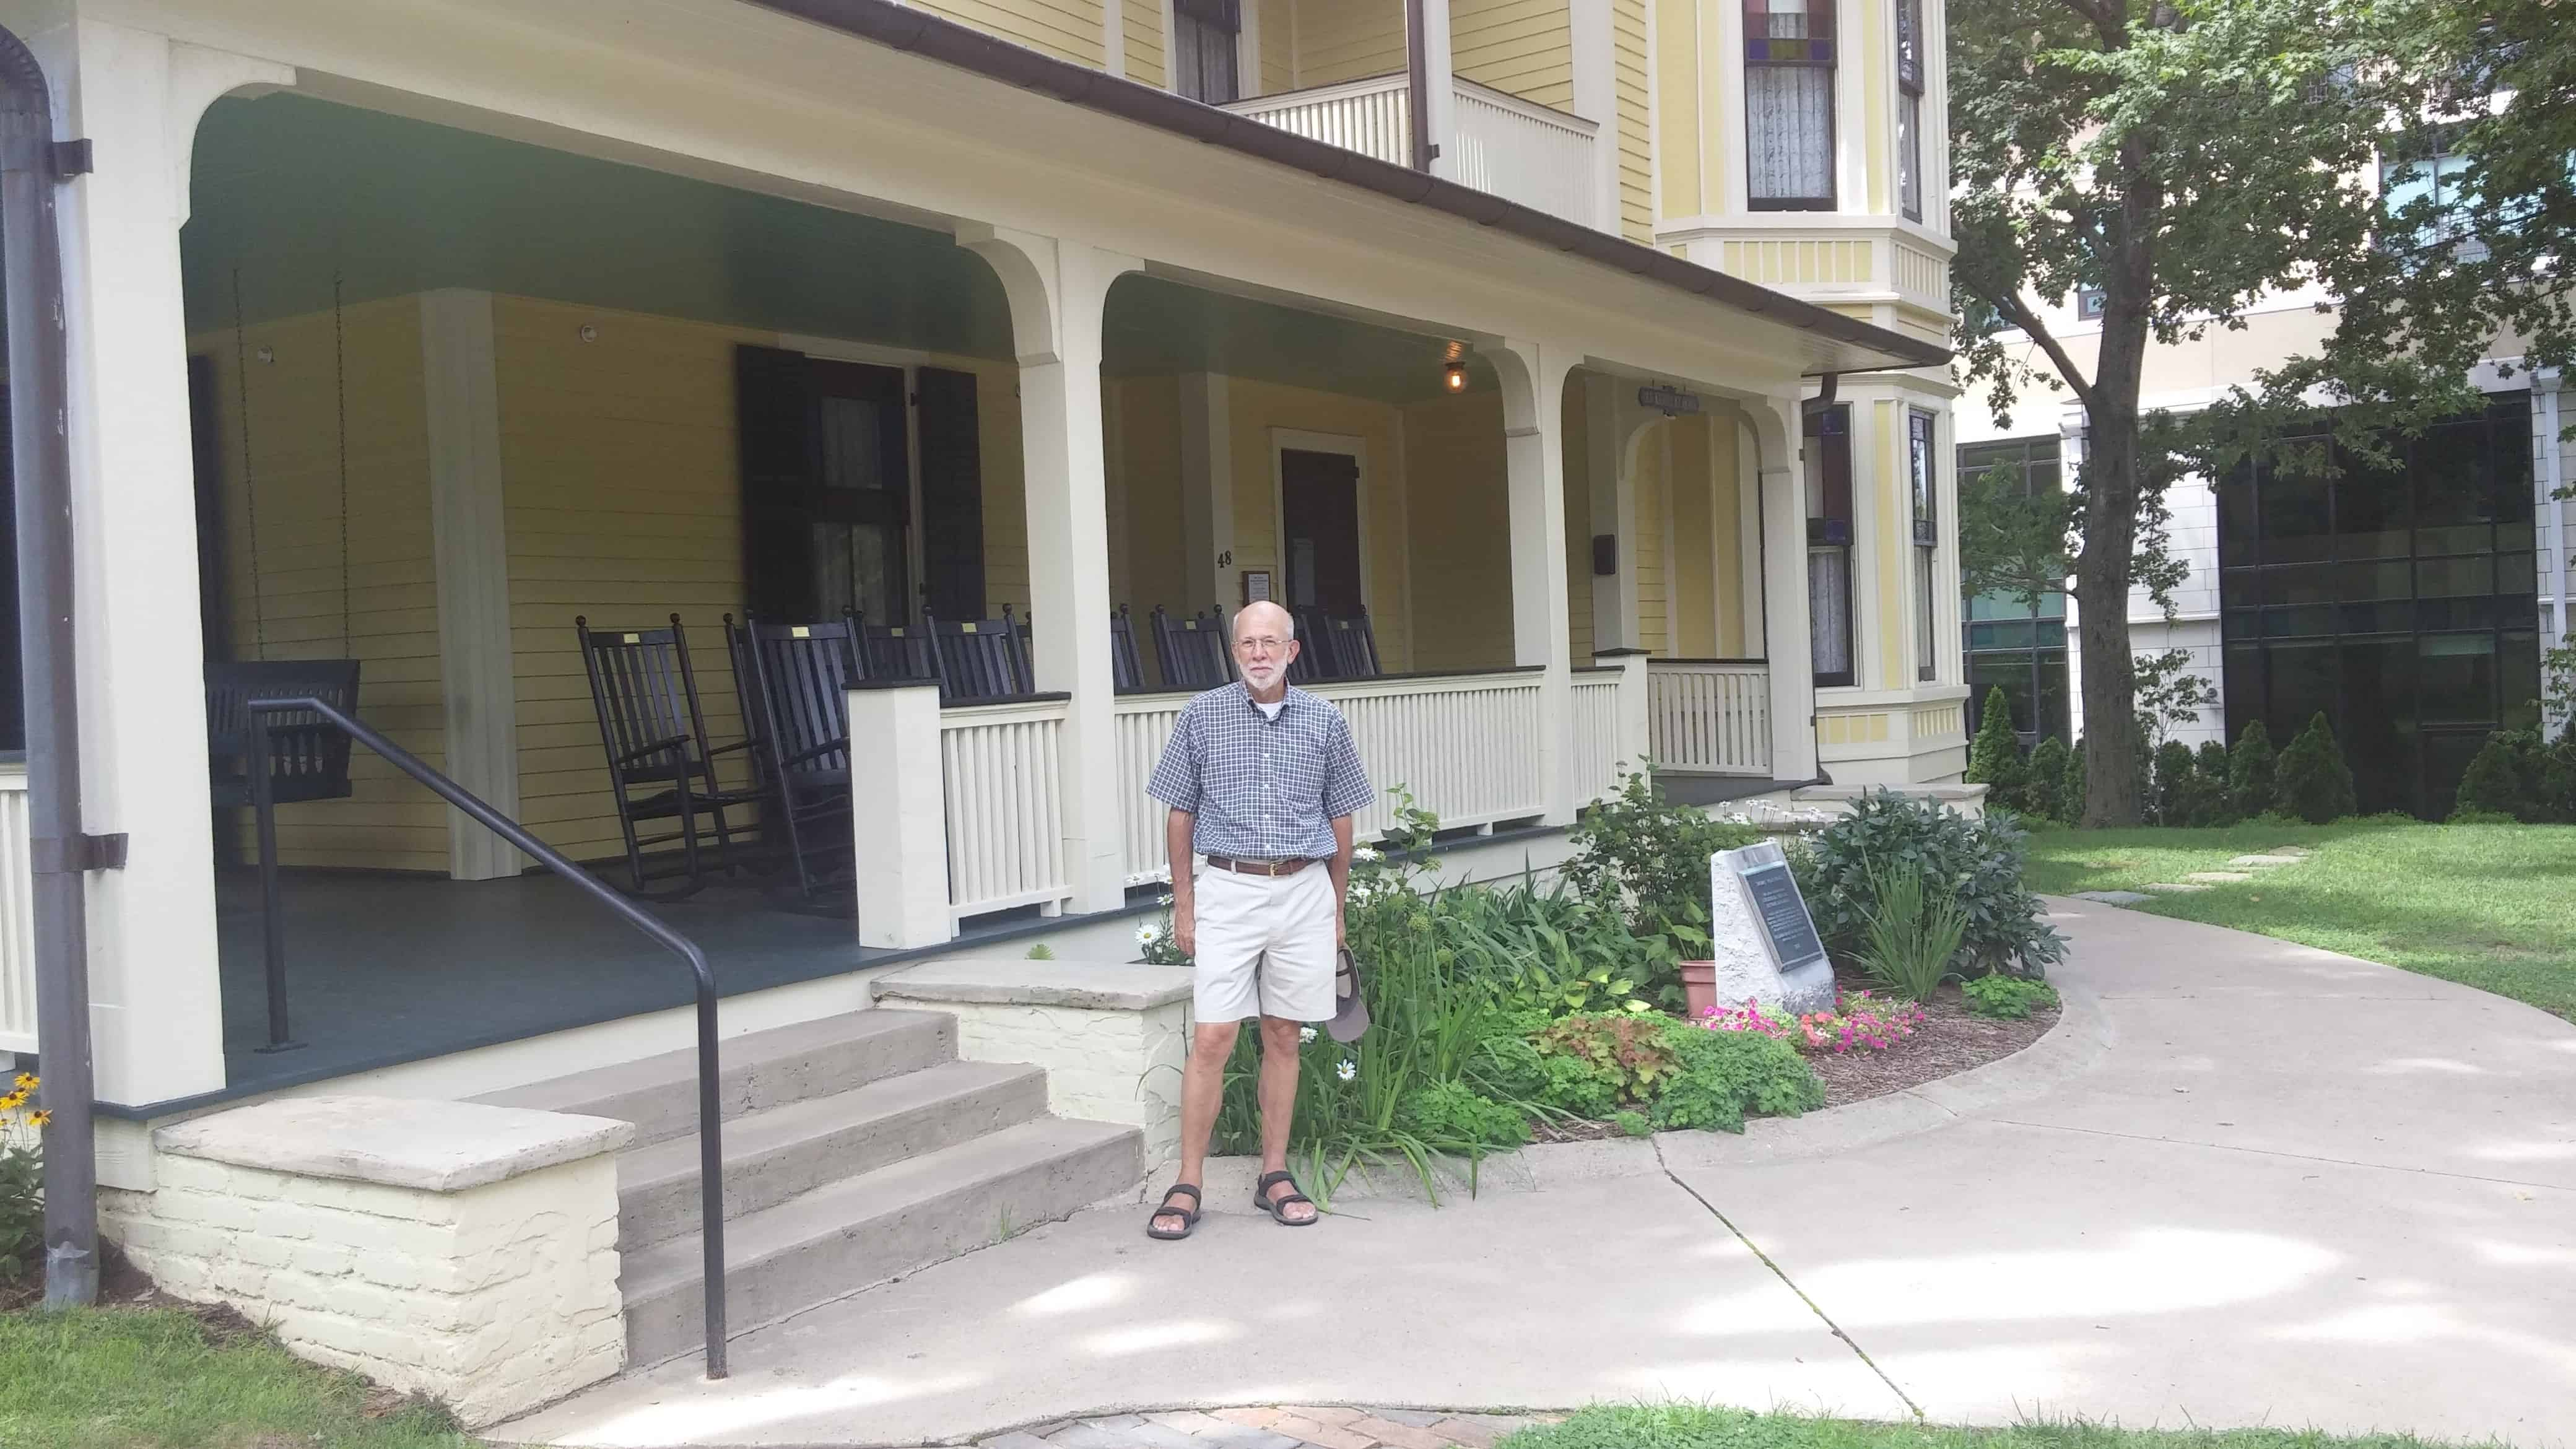 Thomas Wolfe's House